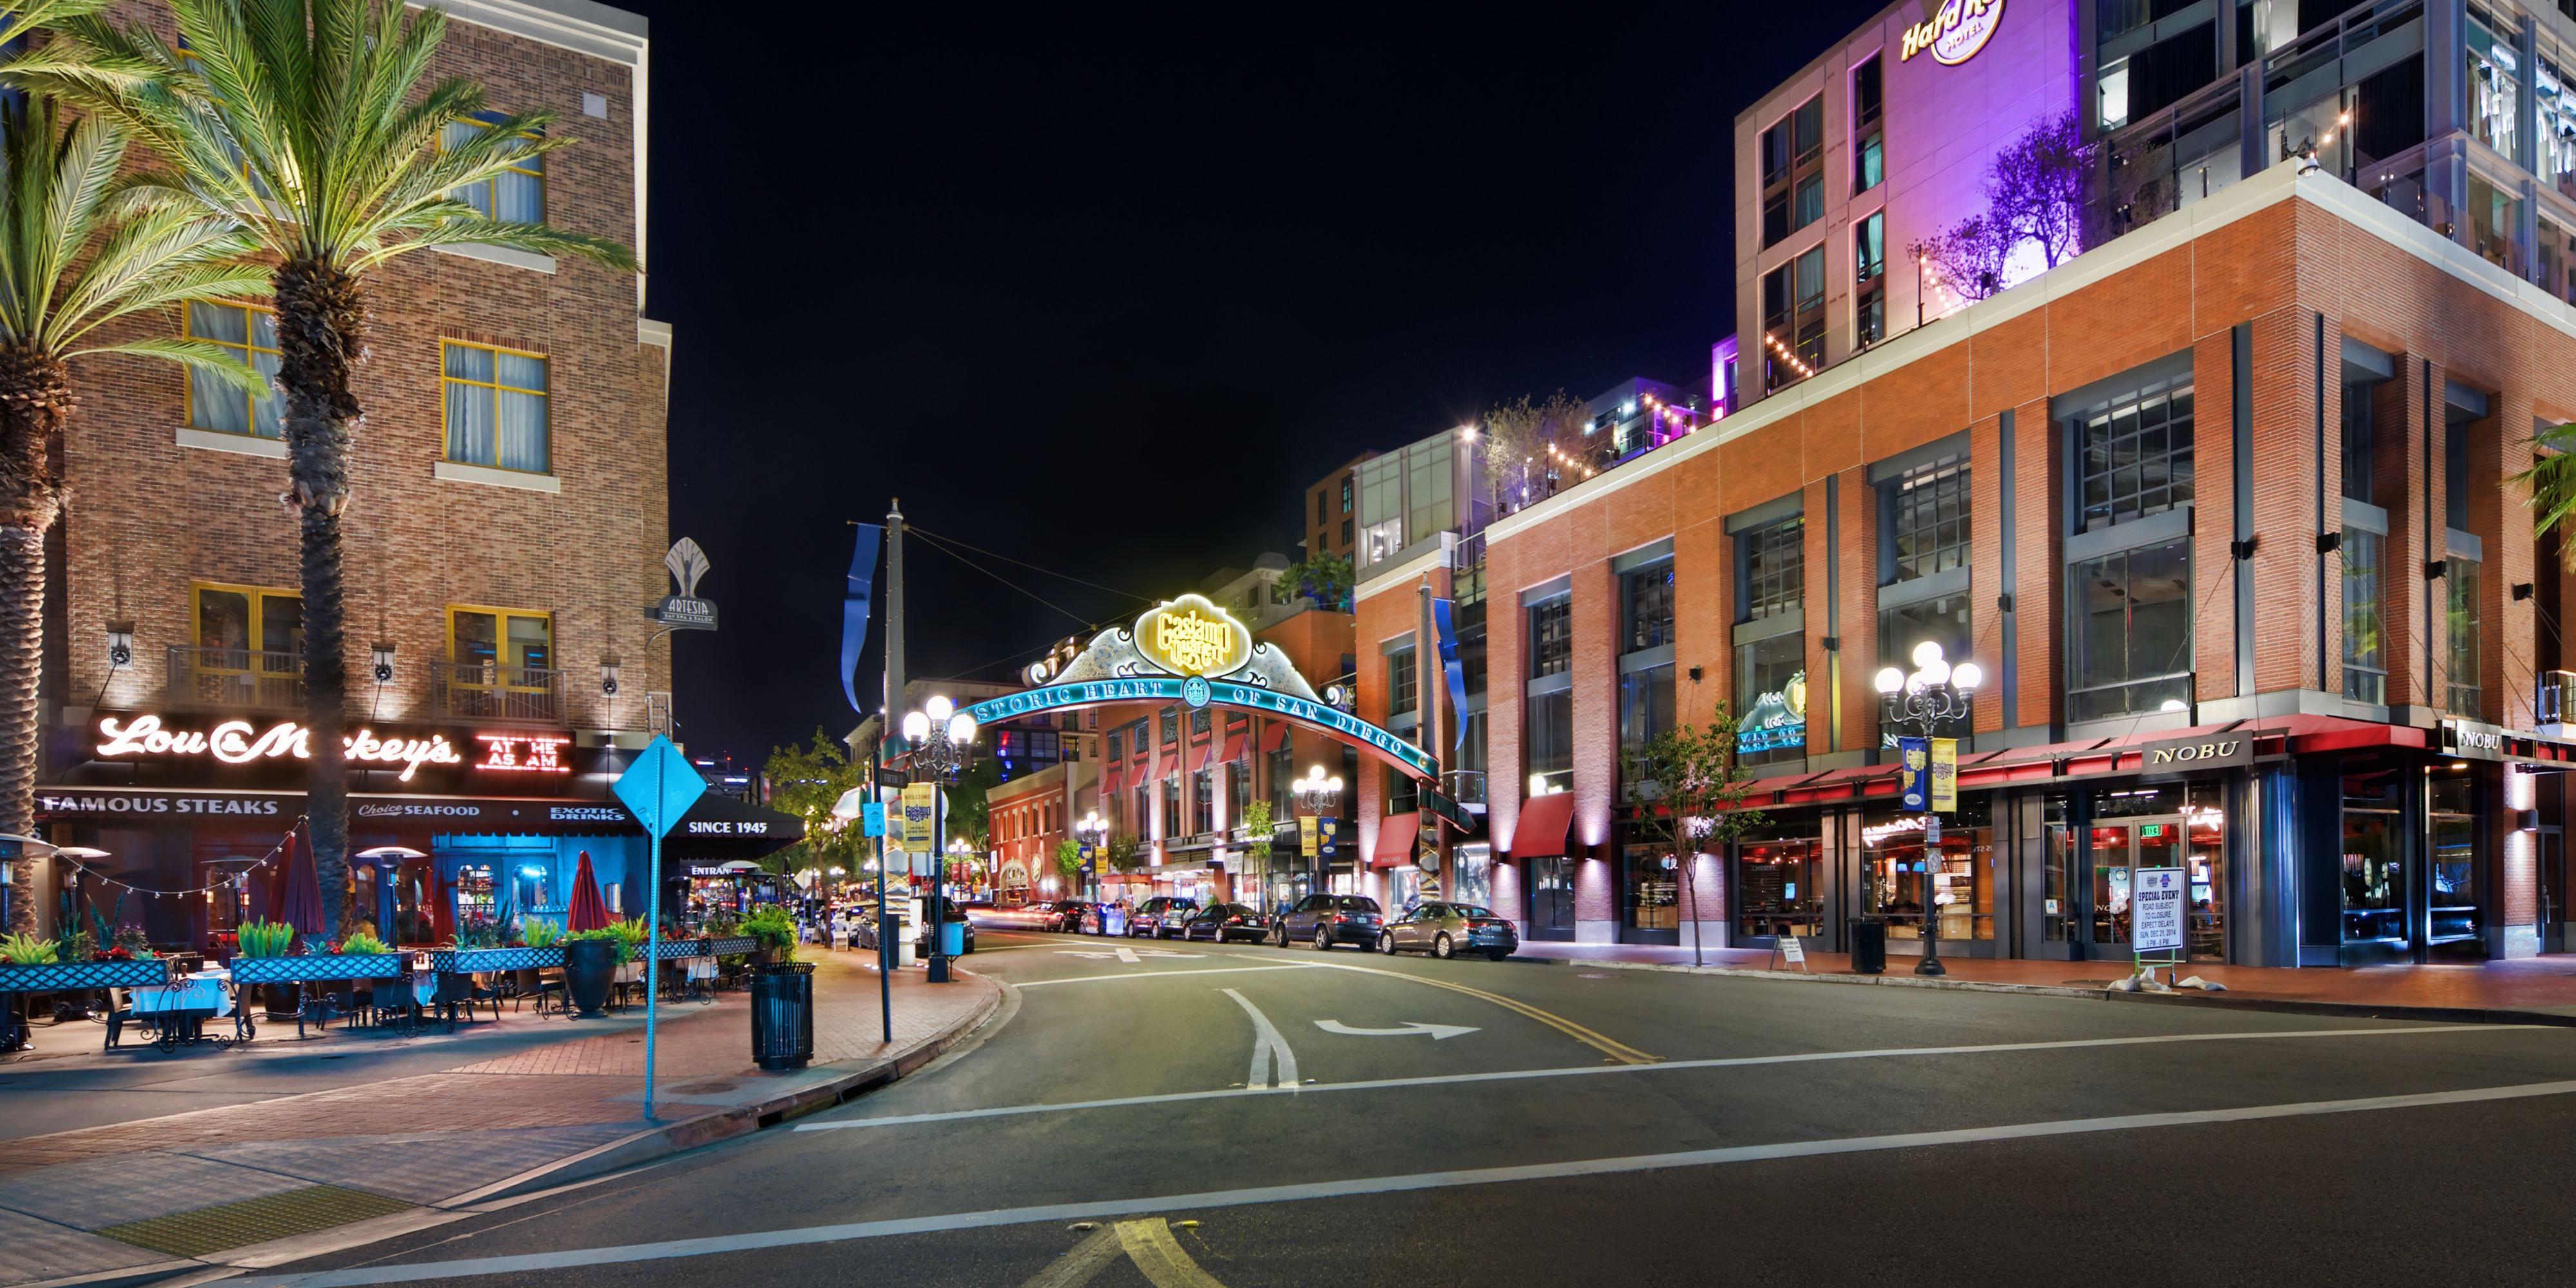 The Hotel Indigo Gaslamp Is Located Ner The Gaslamp Quarter ...